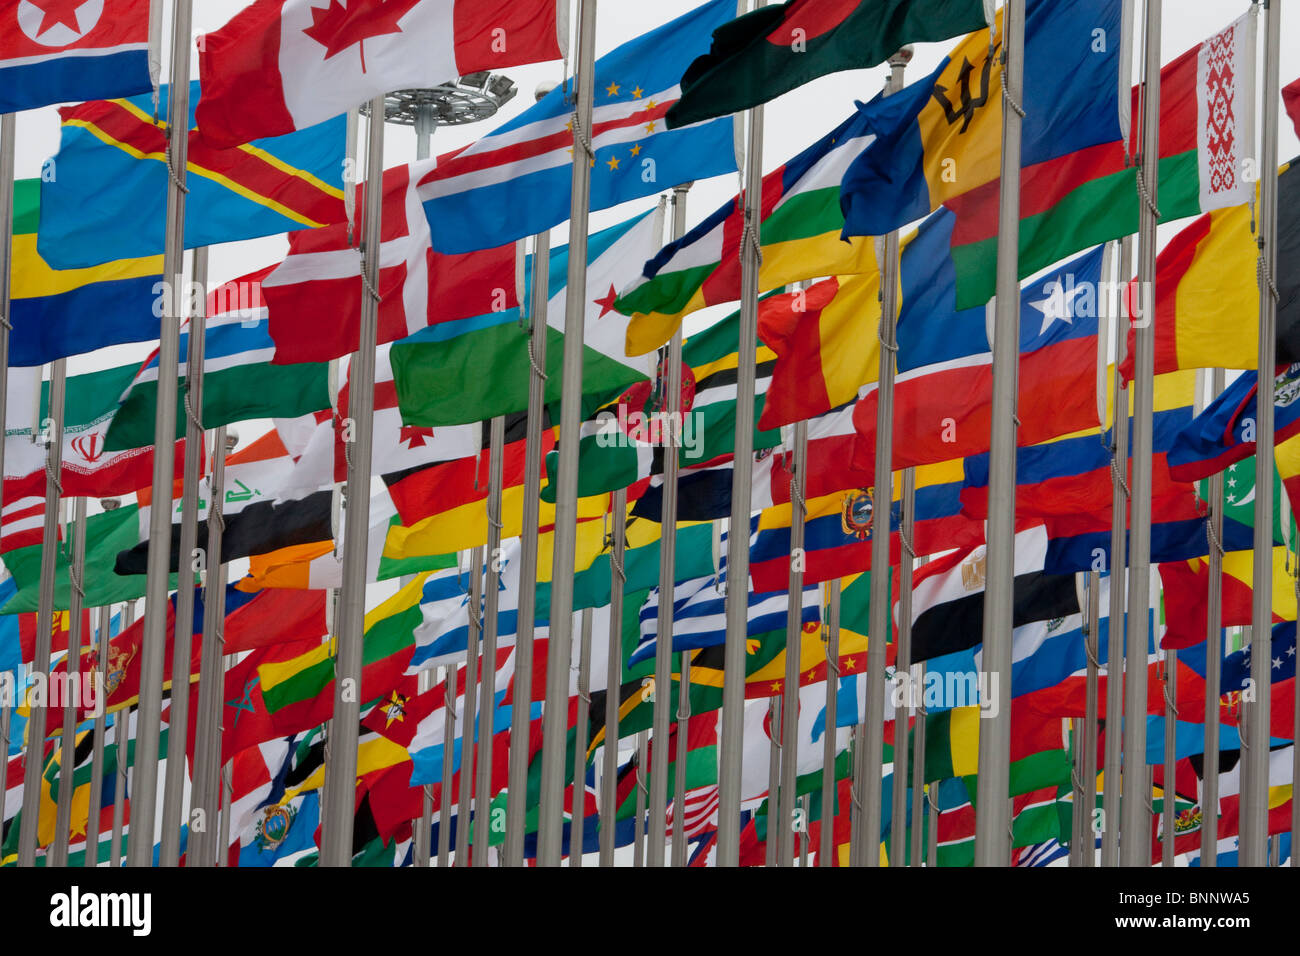 China Shanghai Expo world exhibit flags flags international travel traveling tourism vacation holidays - Stock Image